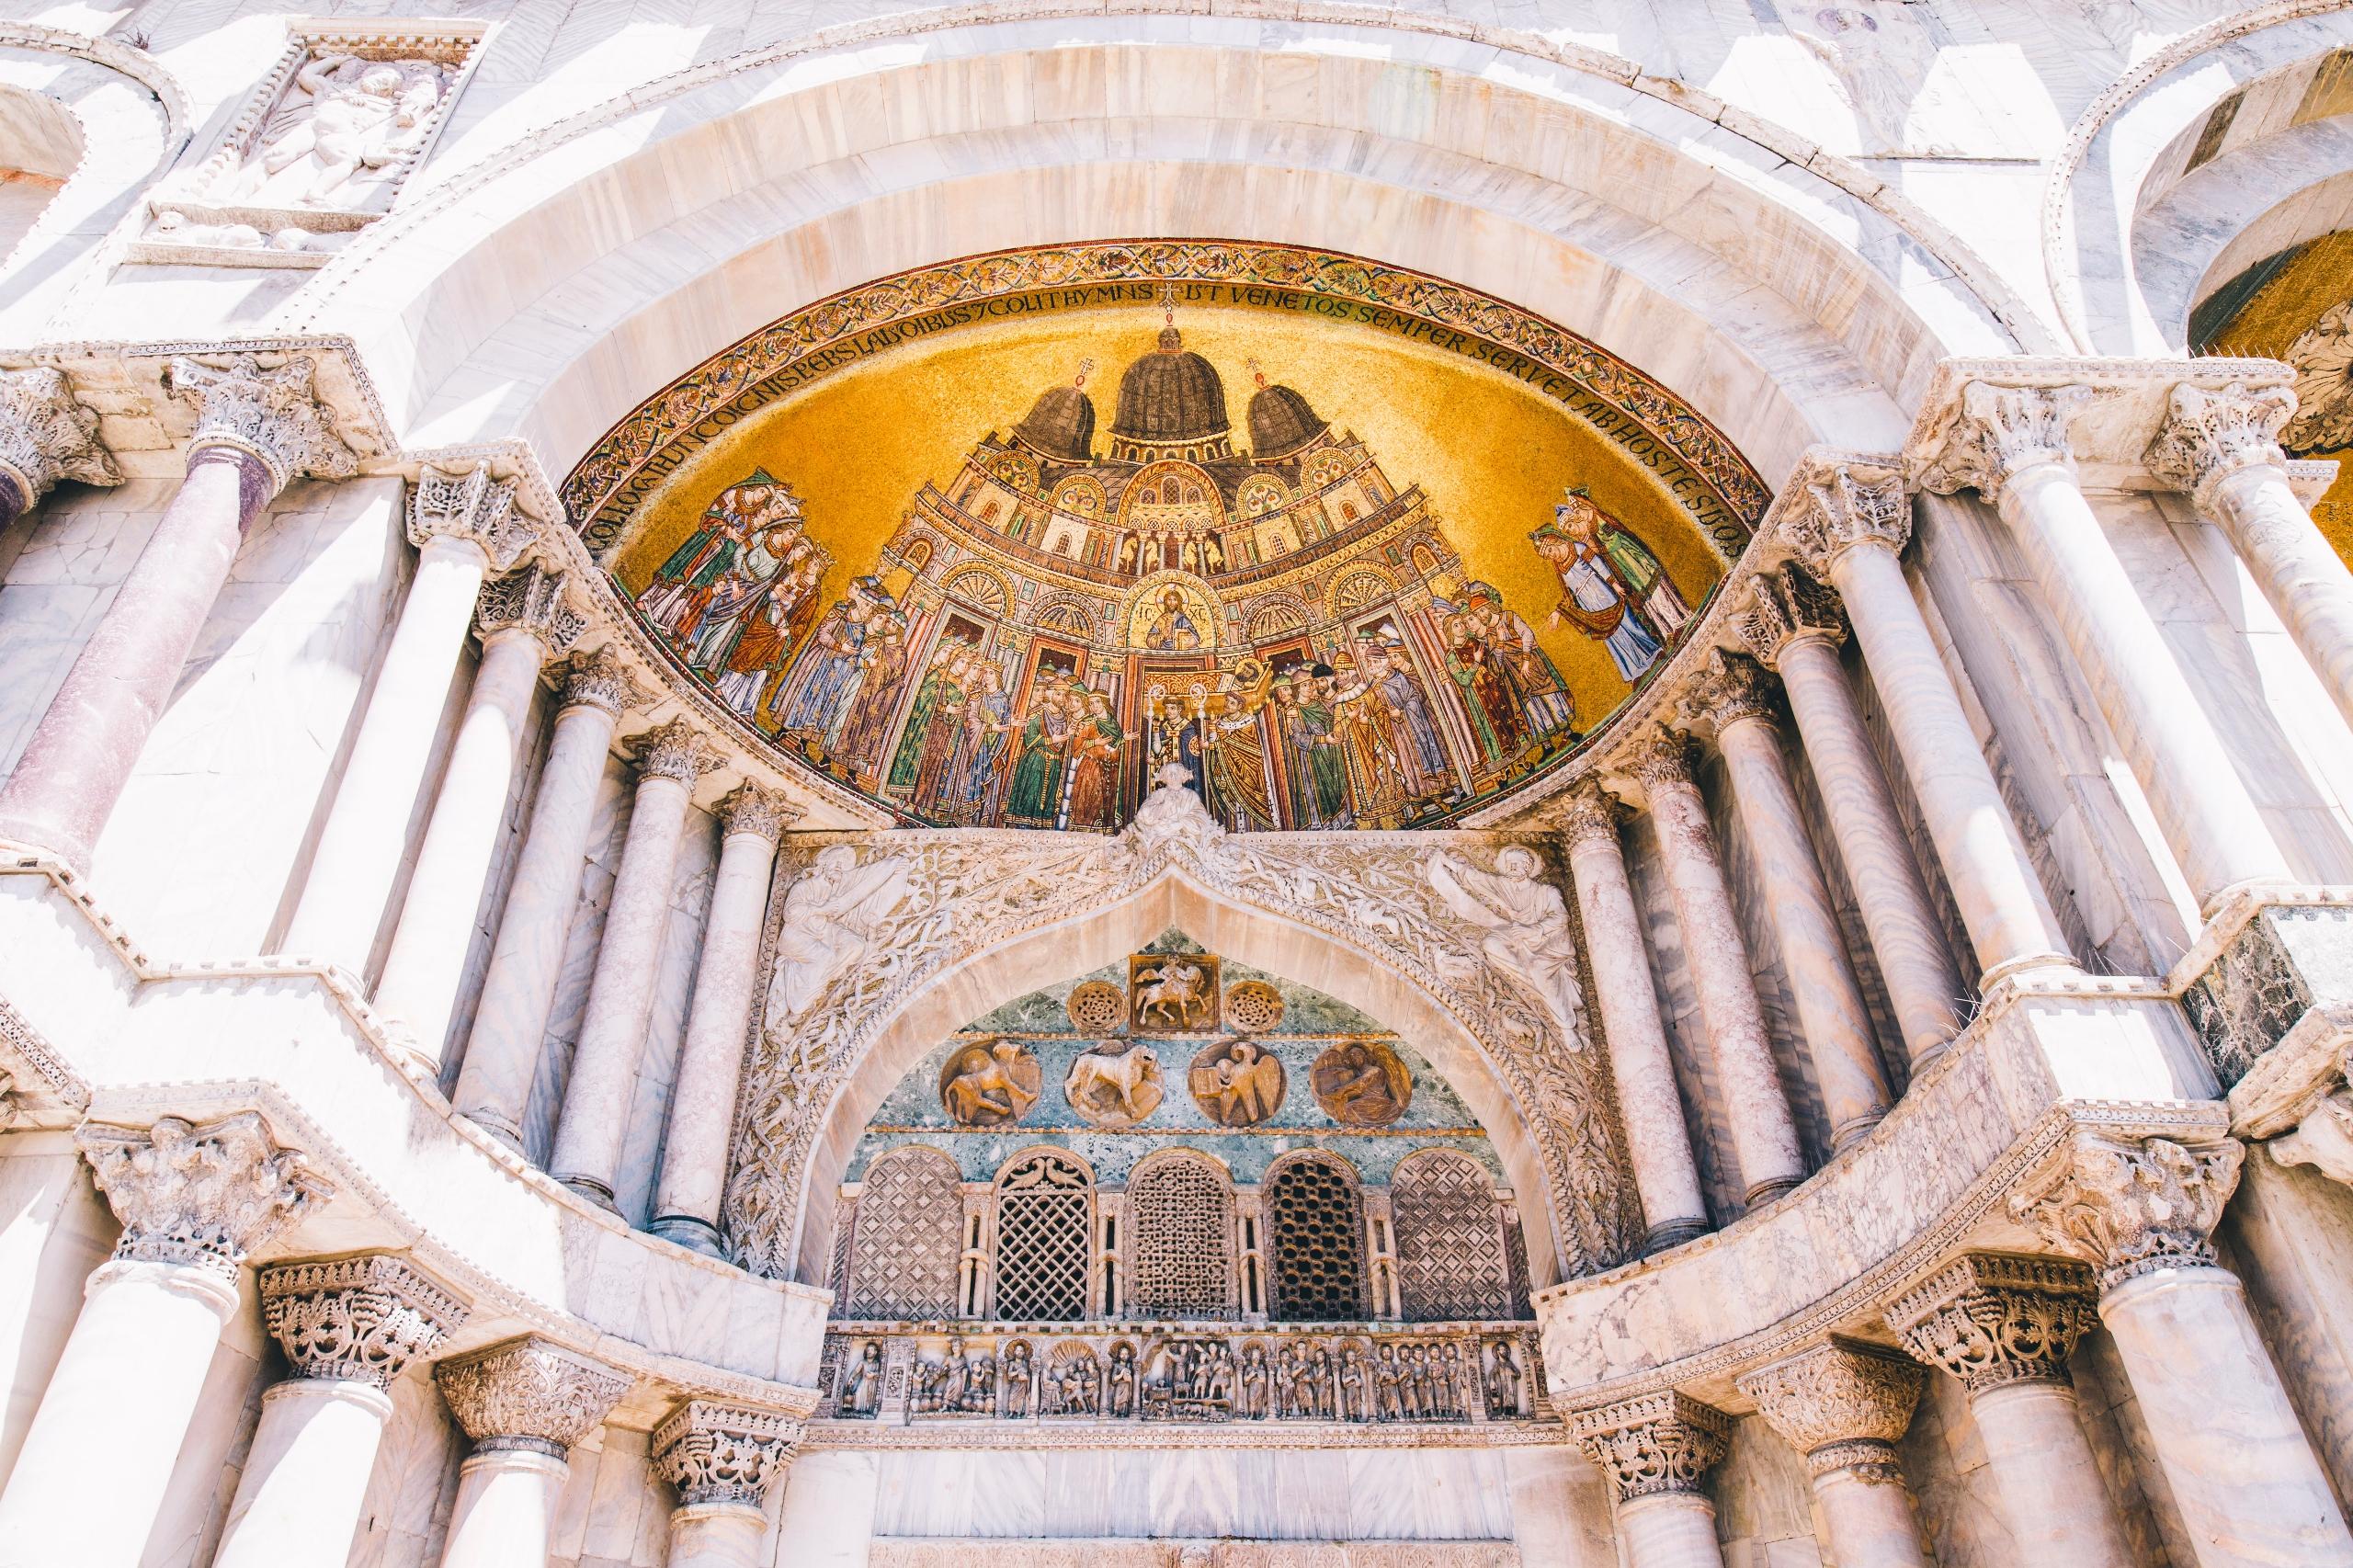 St Basilica - photography, architecture - domreess | ello